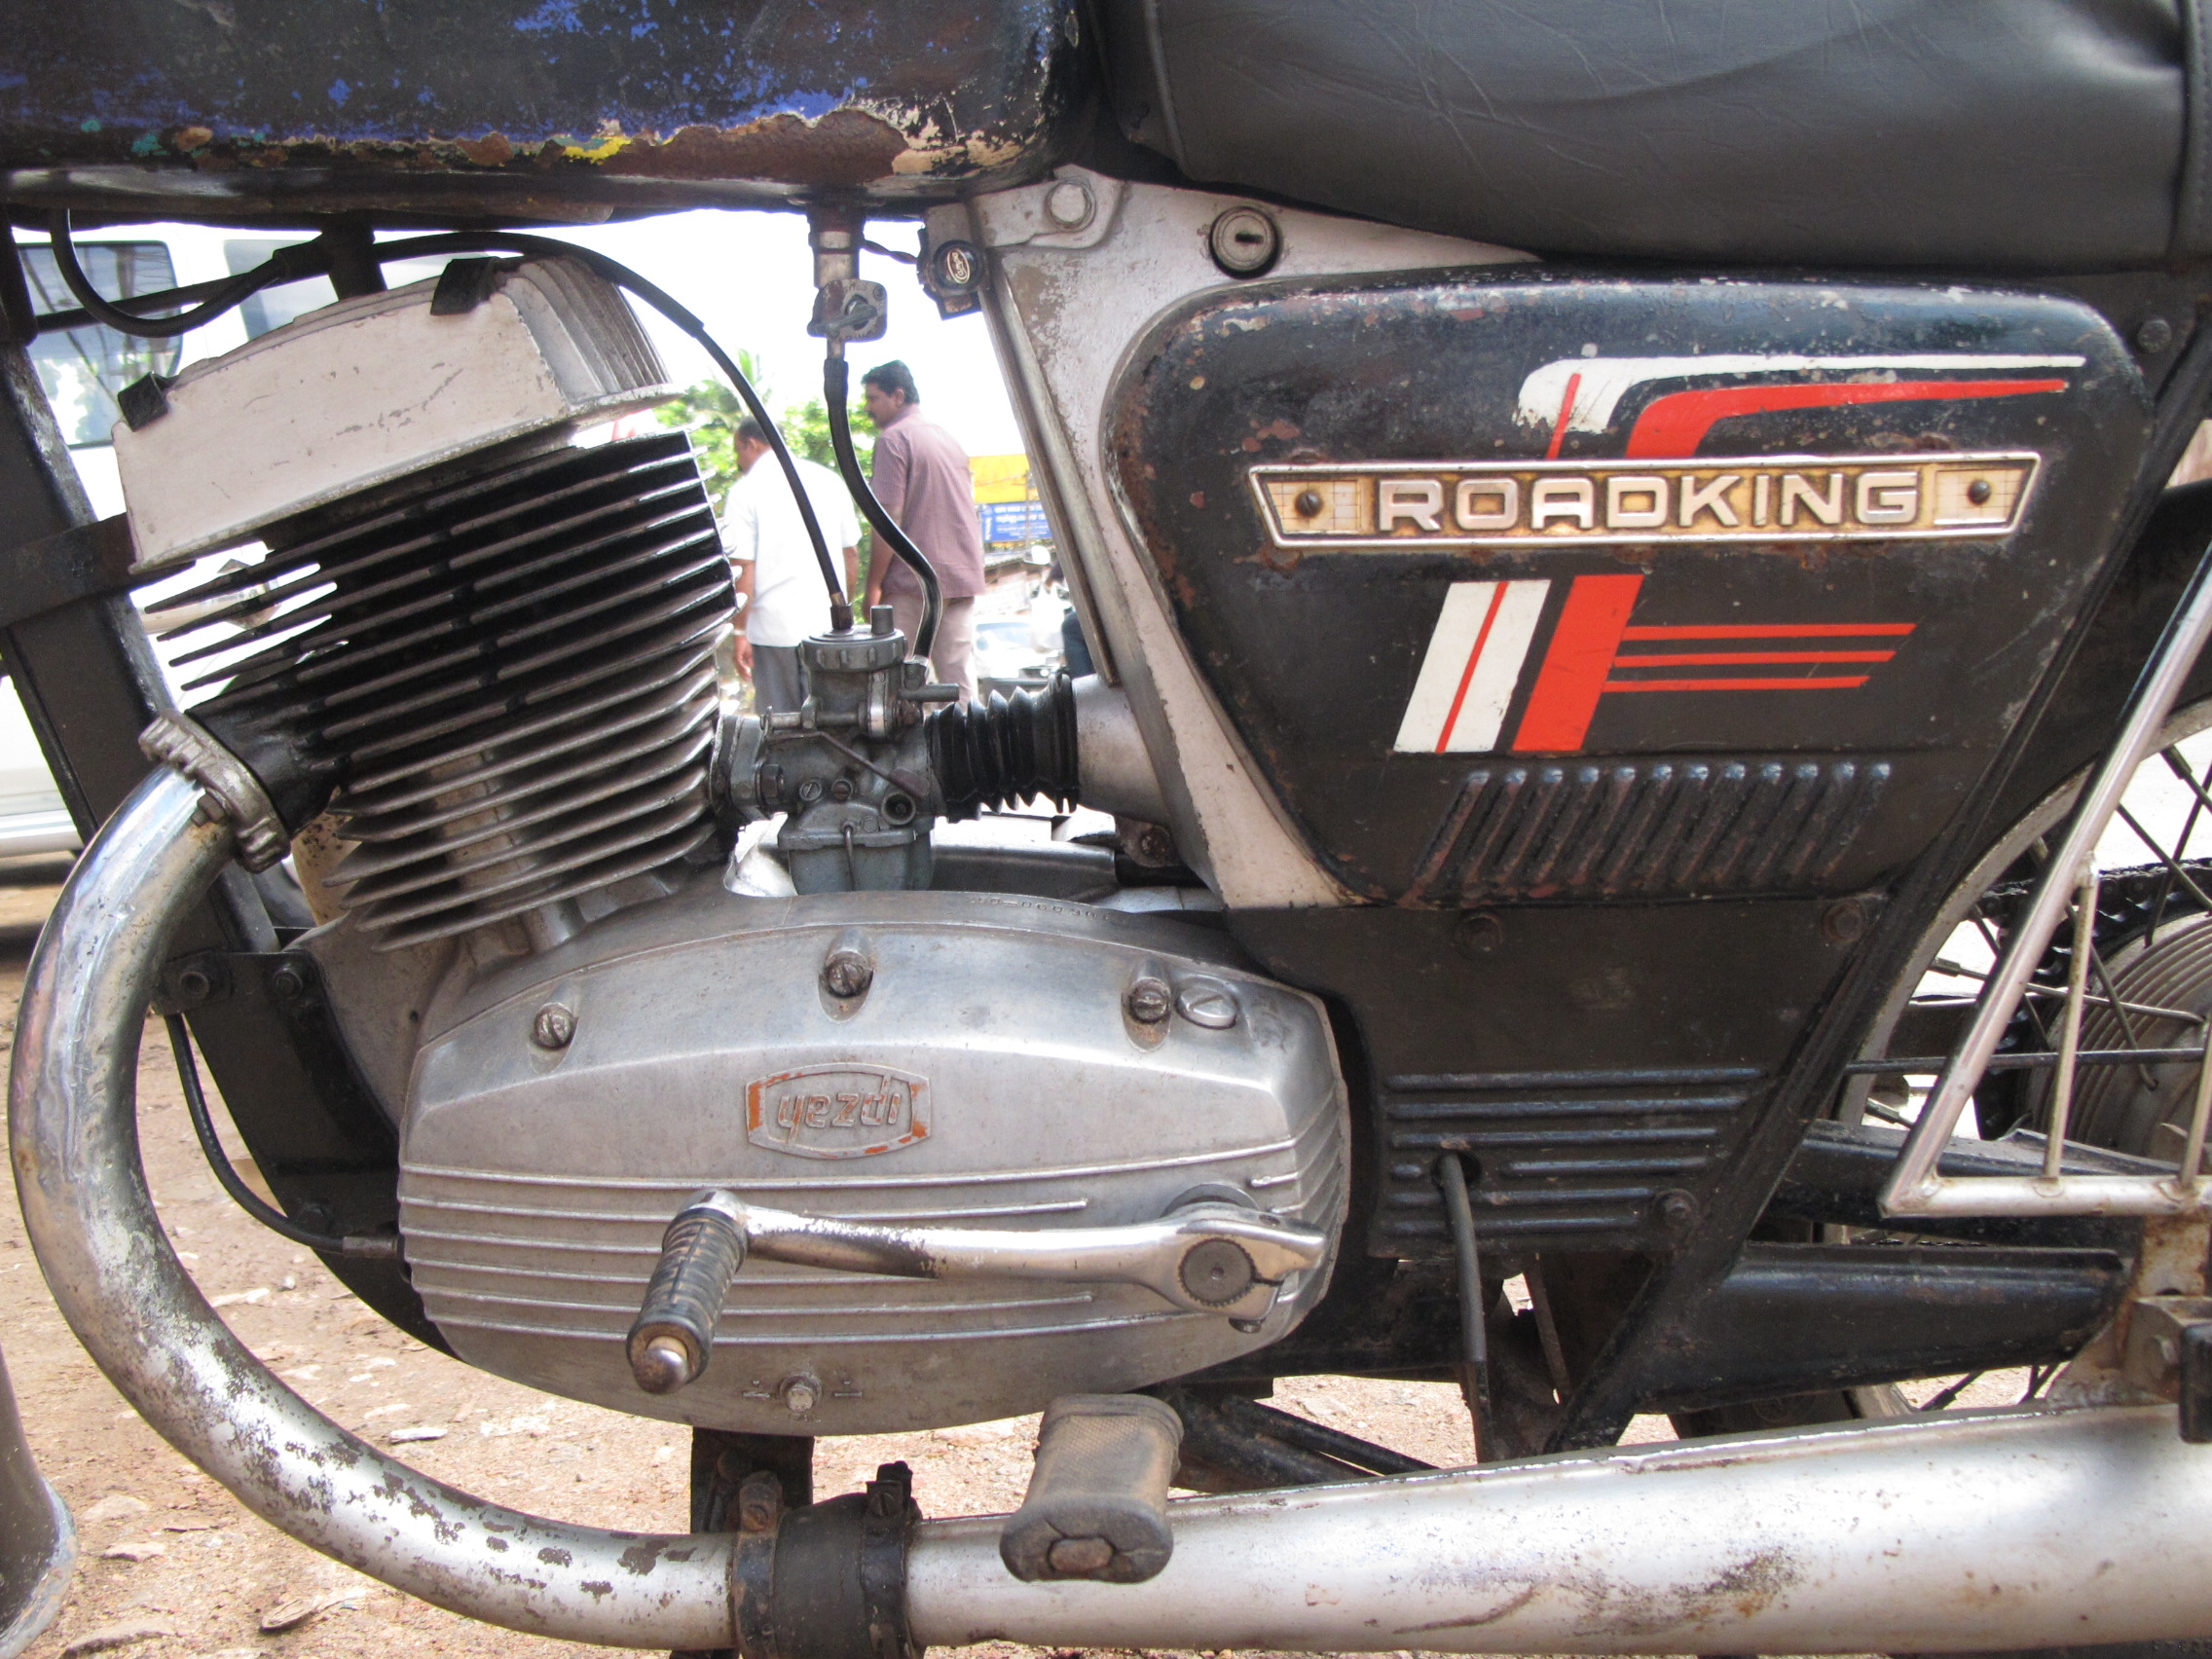 Two stroke engine closeup two wheeler motor macro photo motorcycle